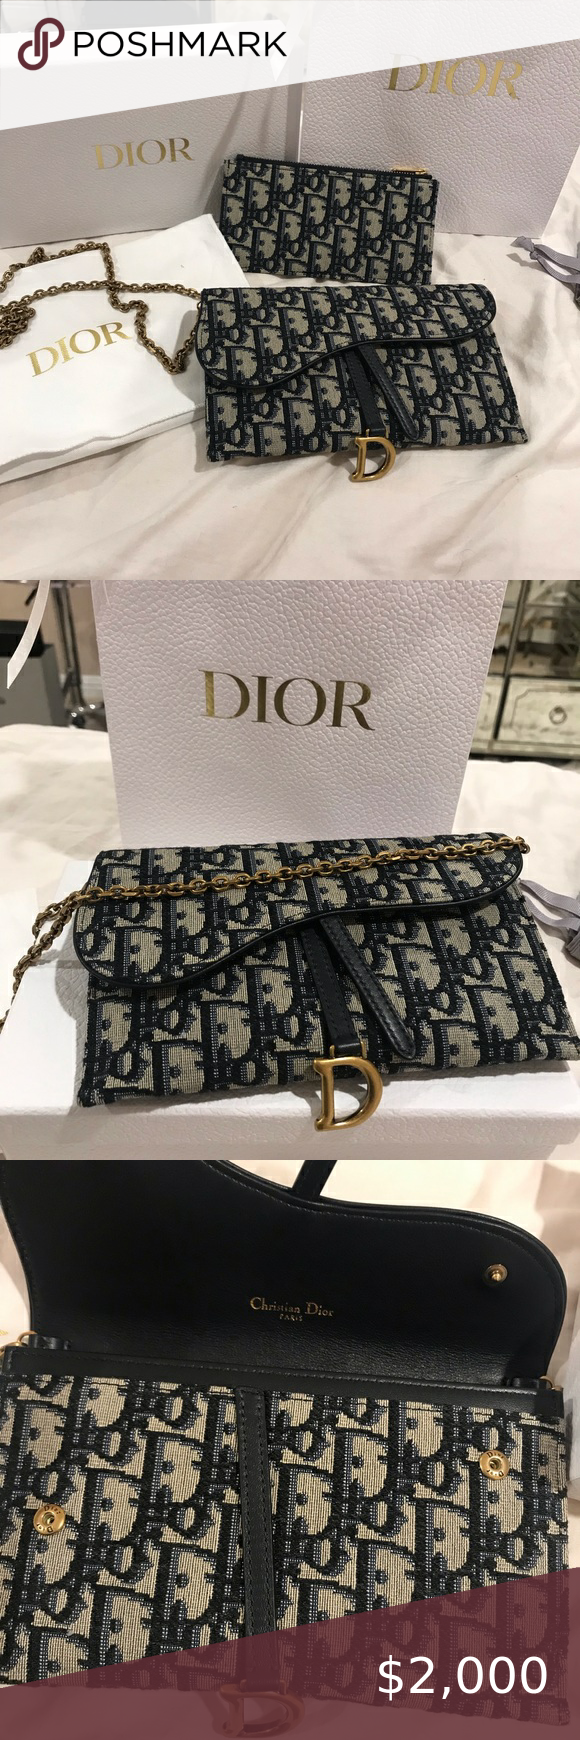 Christian Dior Saddle Long Wallet On Chain Bag Christian Dior Bags Dior Chain Bags